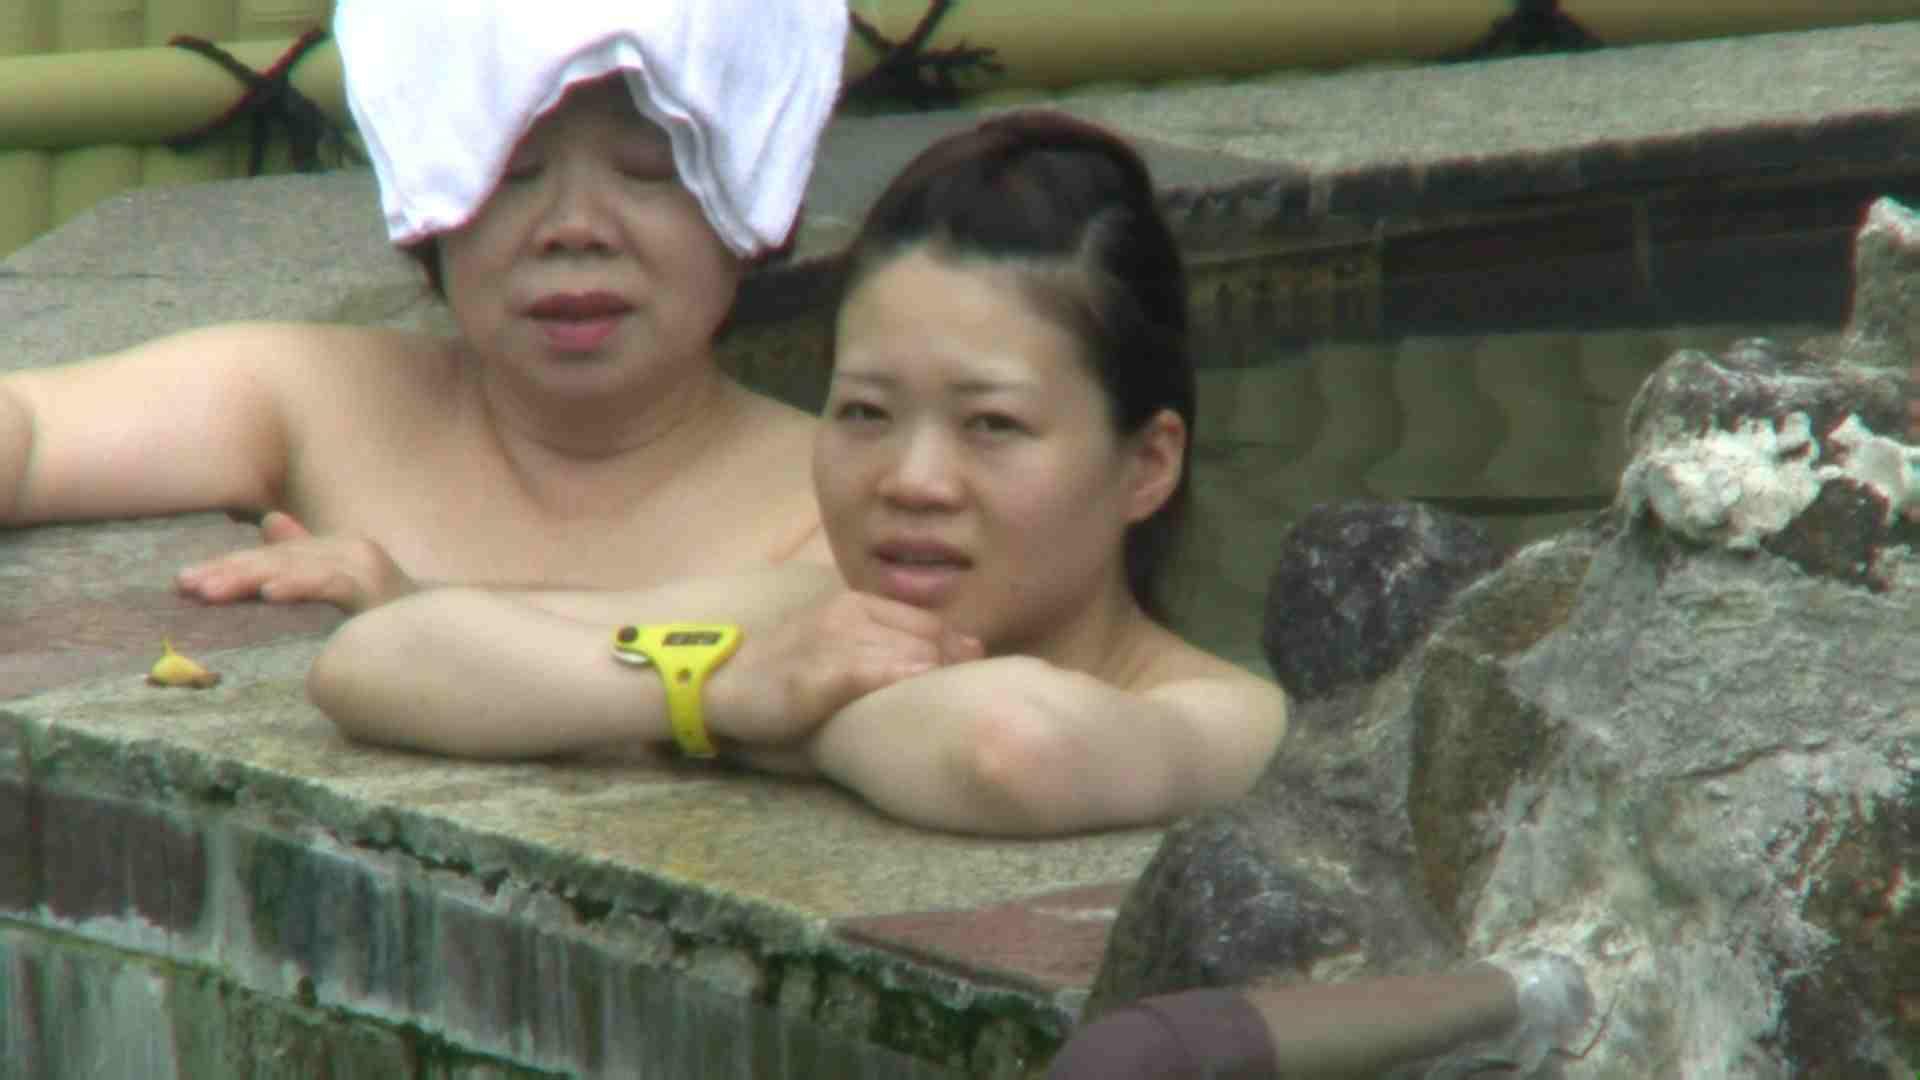 Aquaな露天風呂Vol.63【VIP限定】 HなOL おめこ無修正動画無料 100pic 27